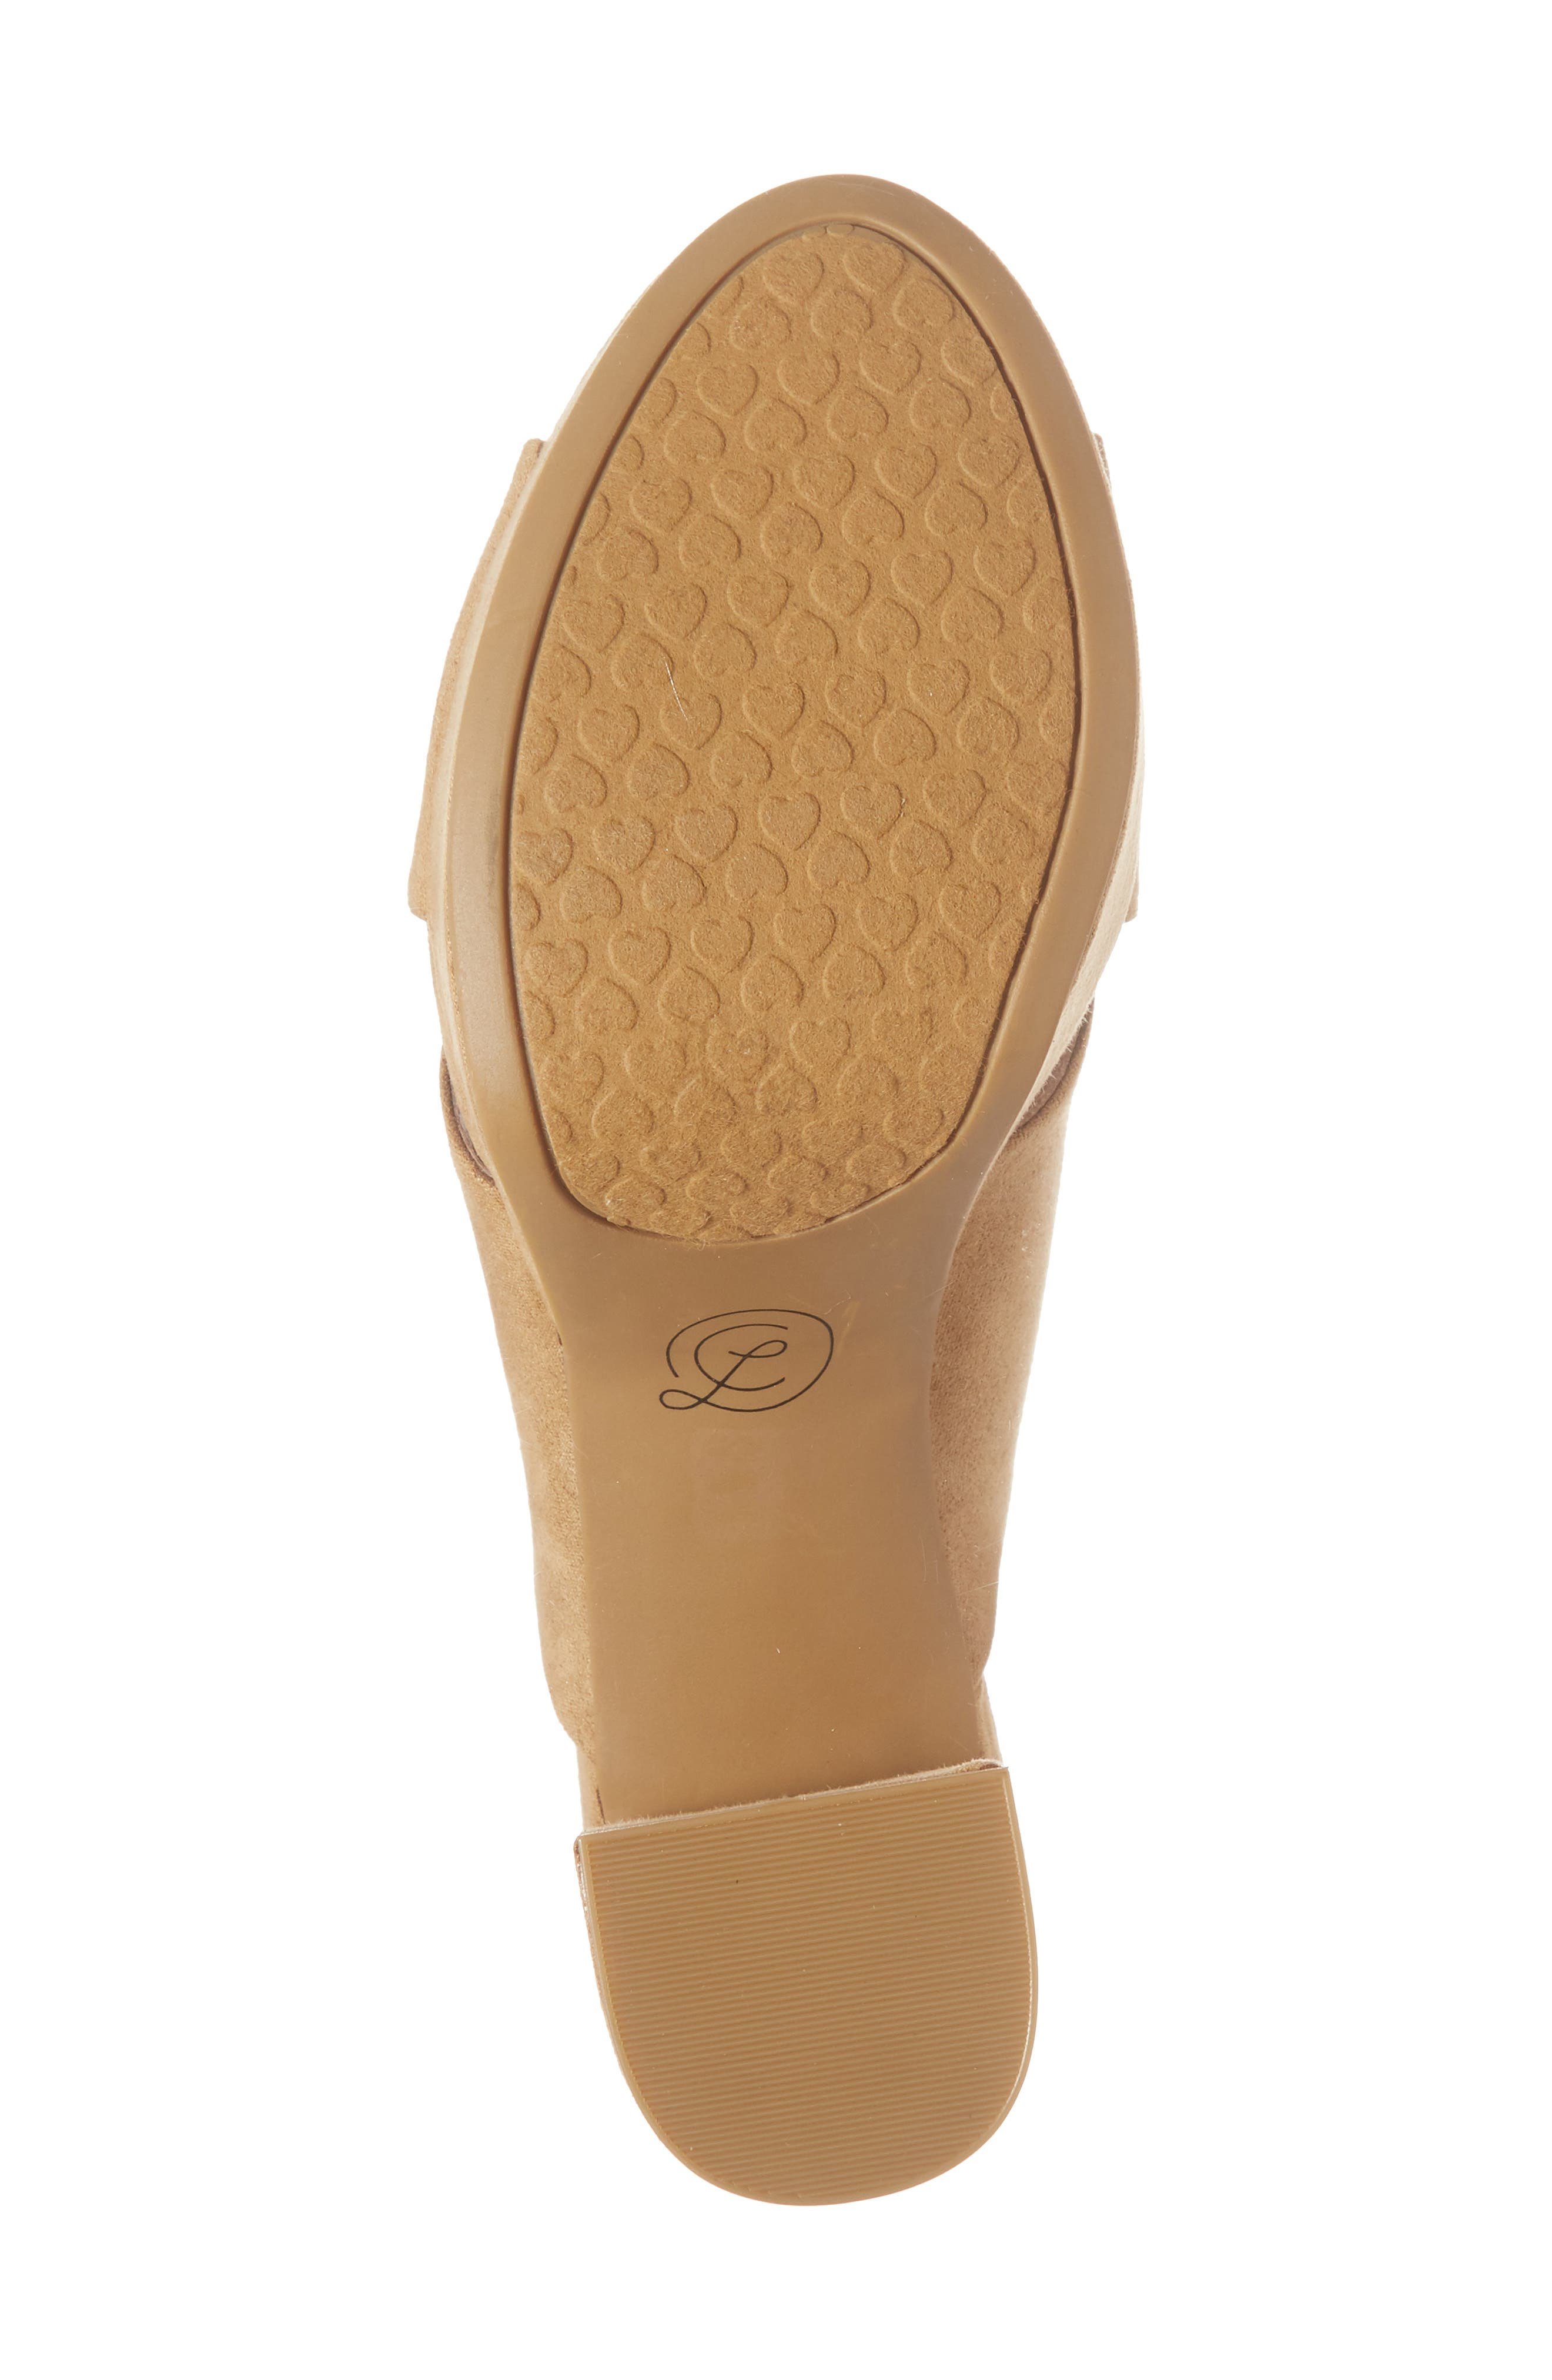 Teagan Cross Strap Platform Sandal,                             Alternate thumbnail 6, color,                             Camel